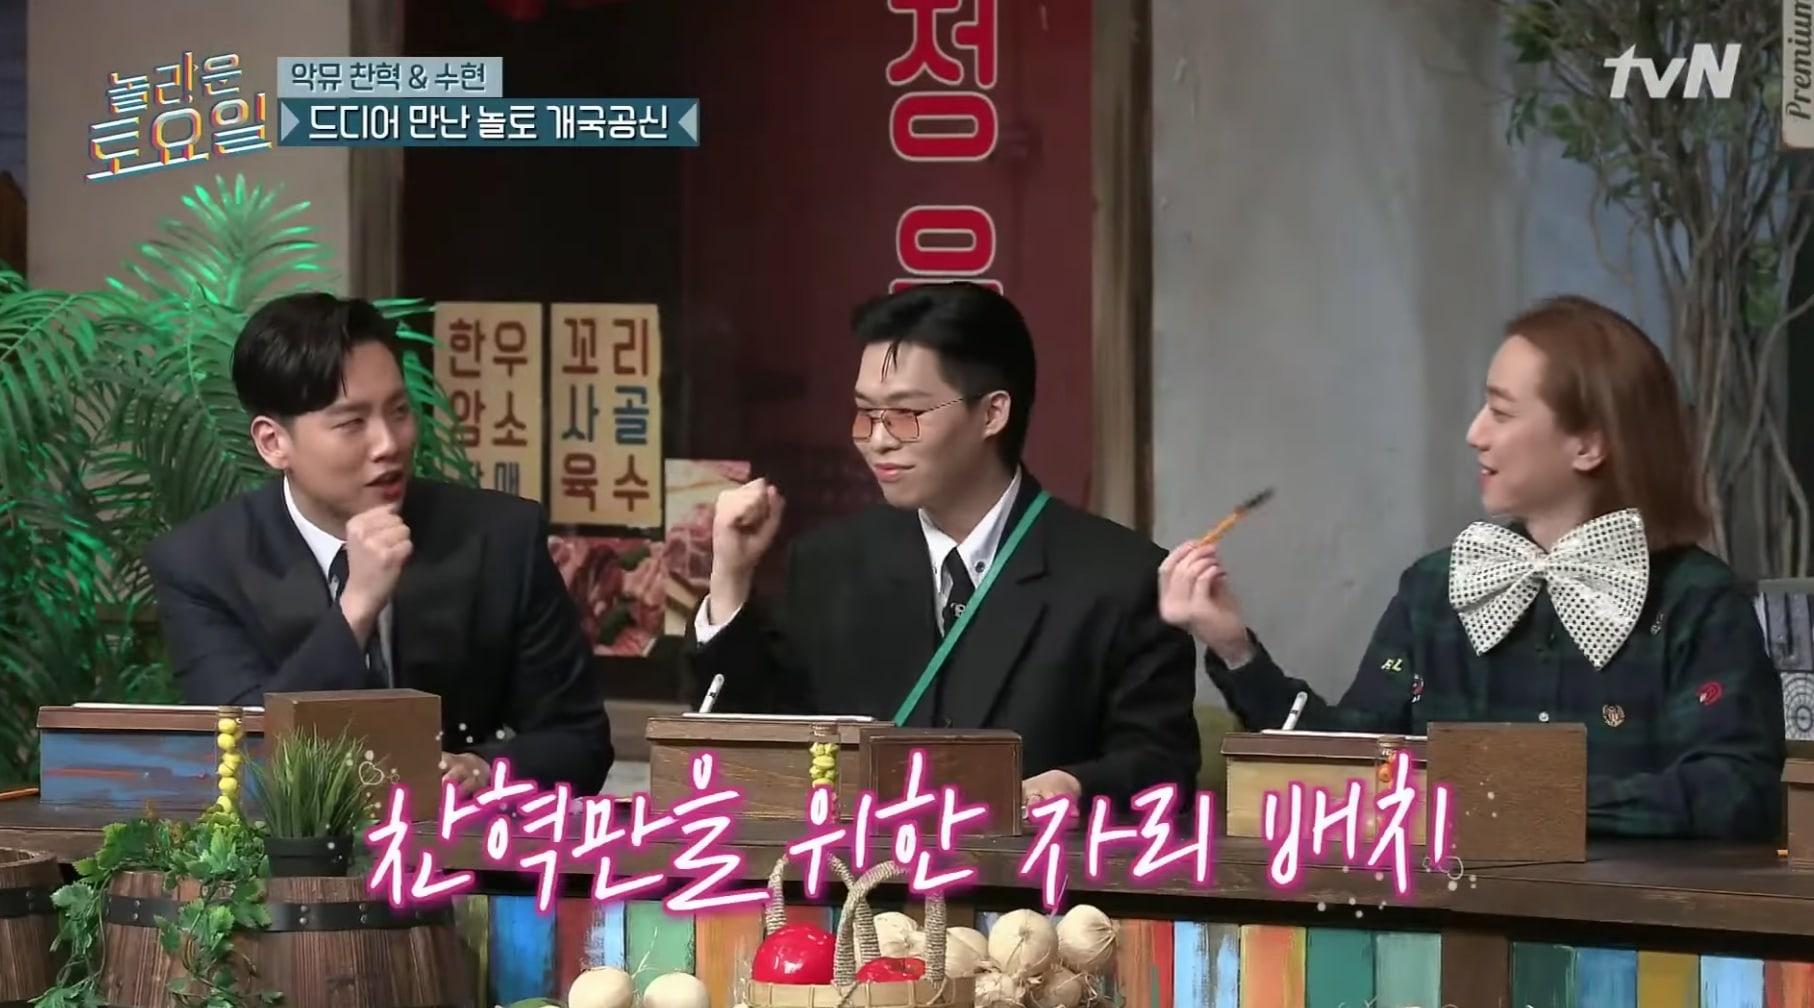 lee-chanhyuk-nucksal-hanhae-amazing-saturday